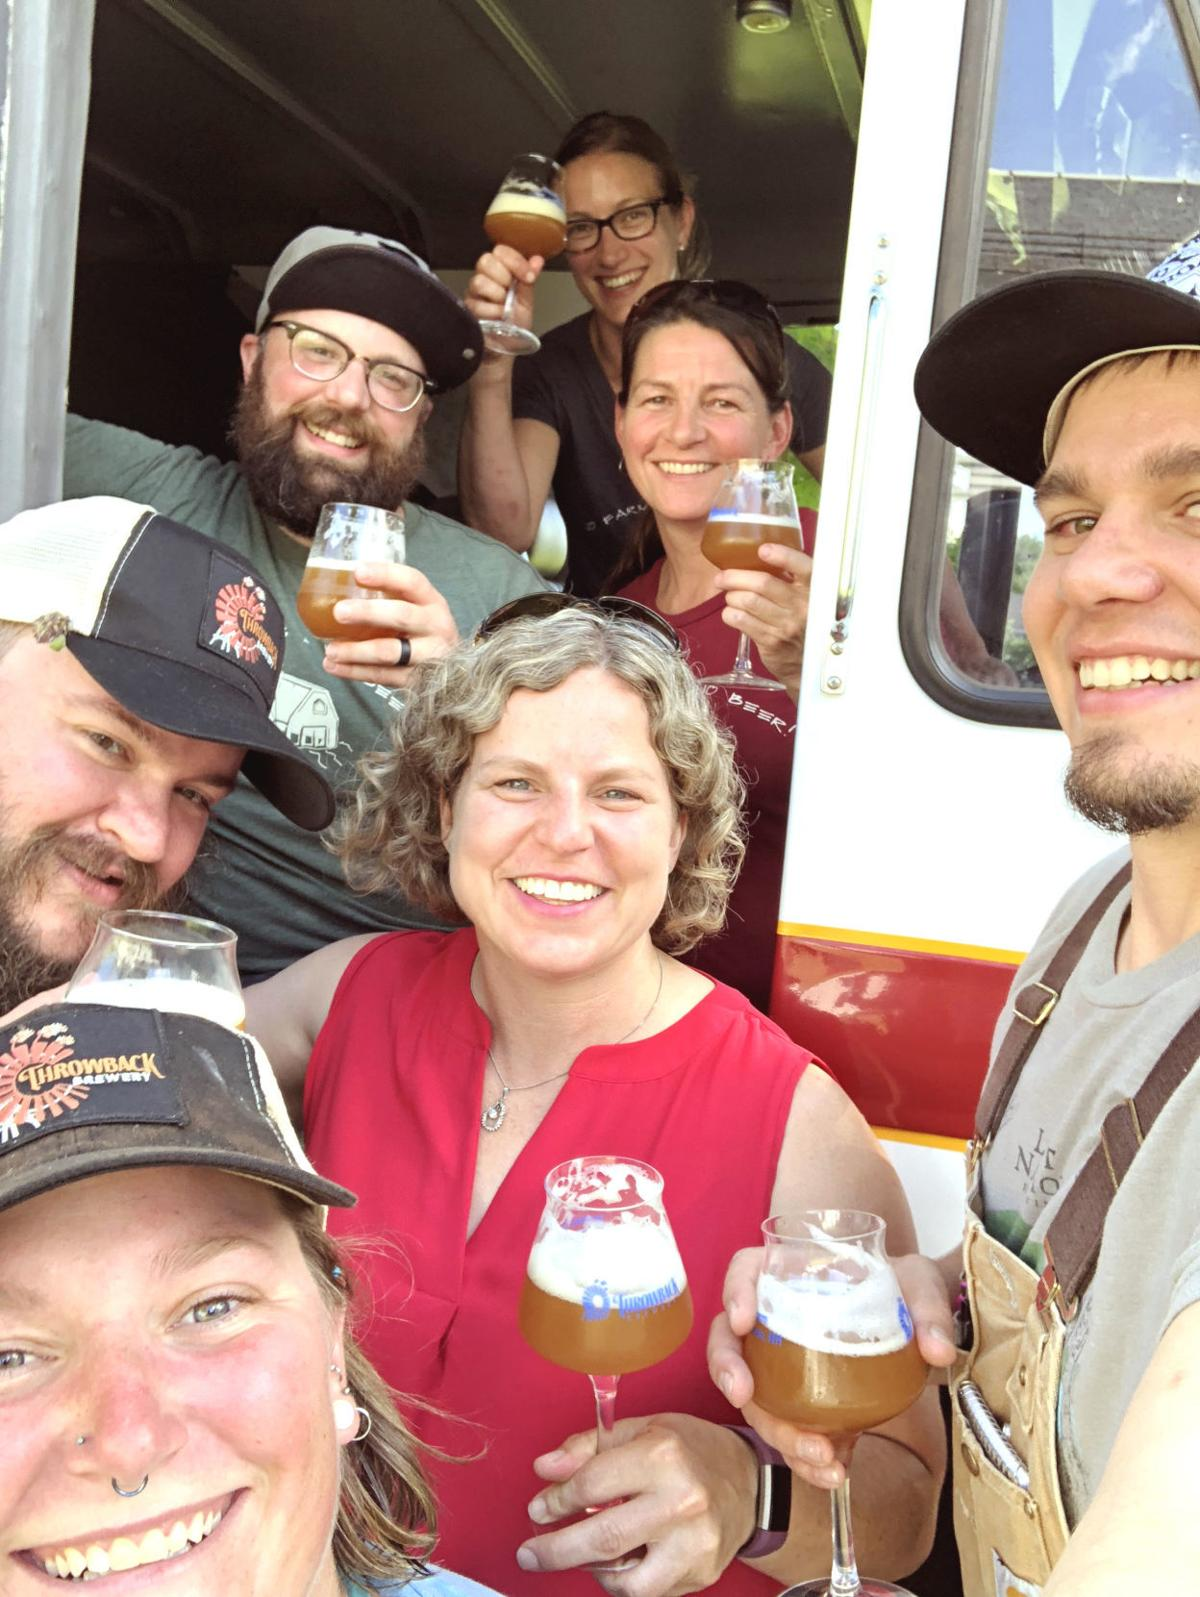 Throwback Brewery staff